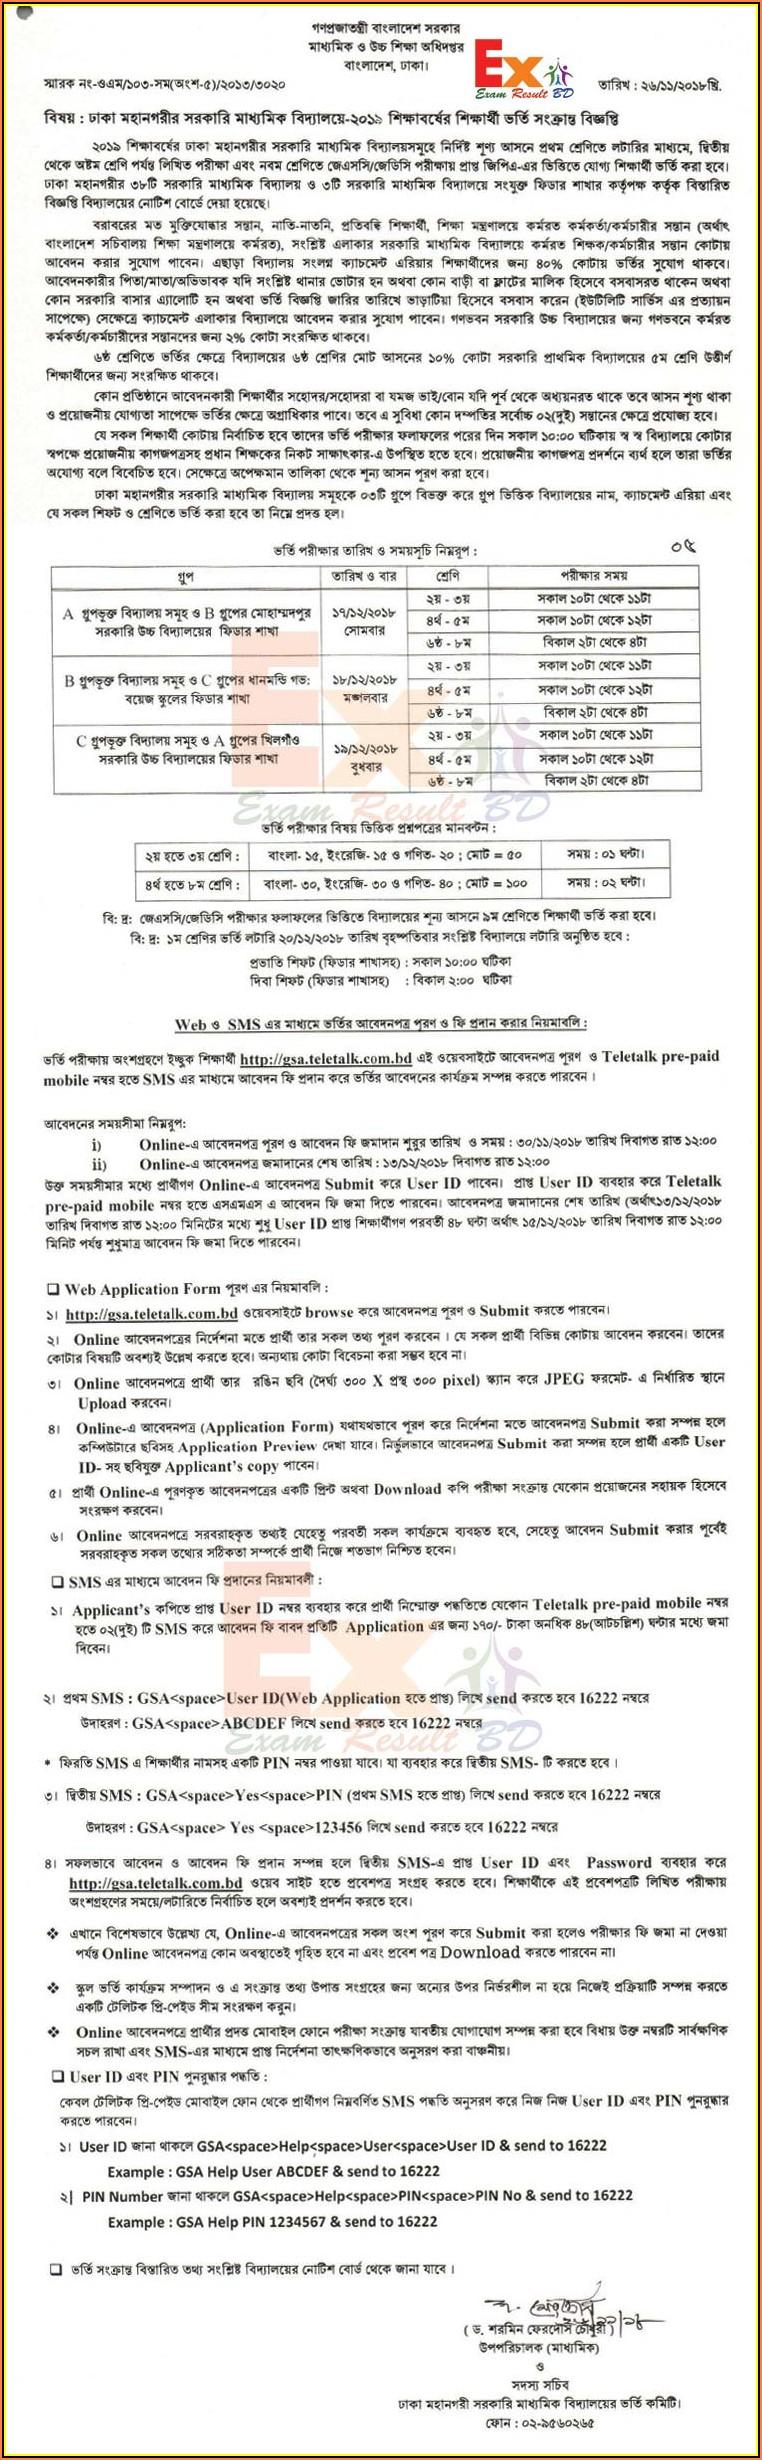 Gsa Saturday School Application Form